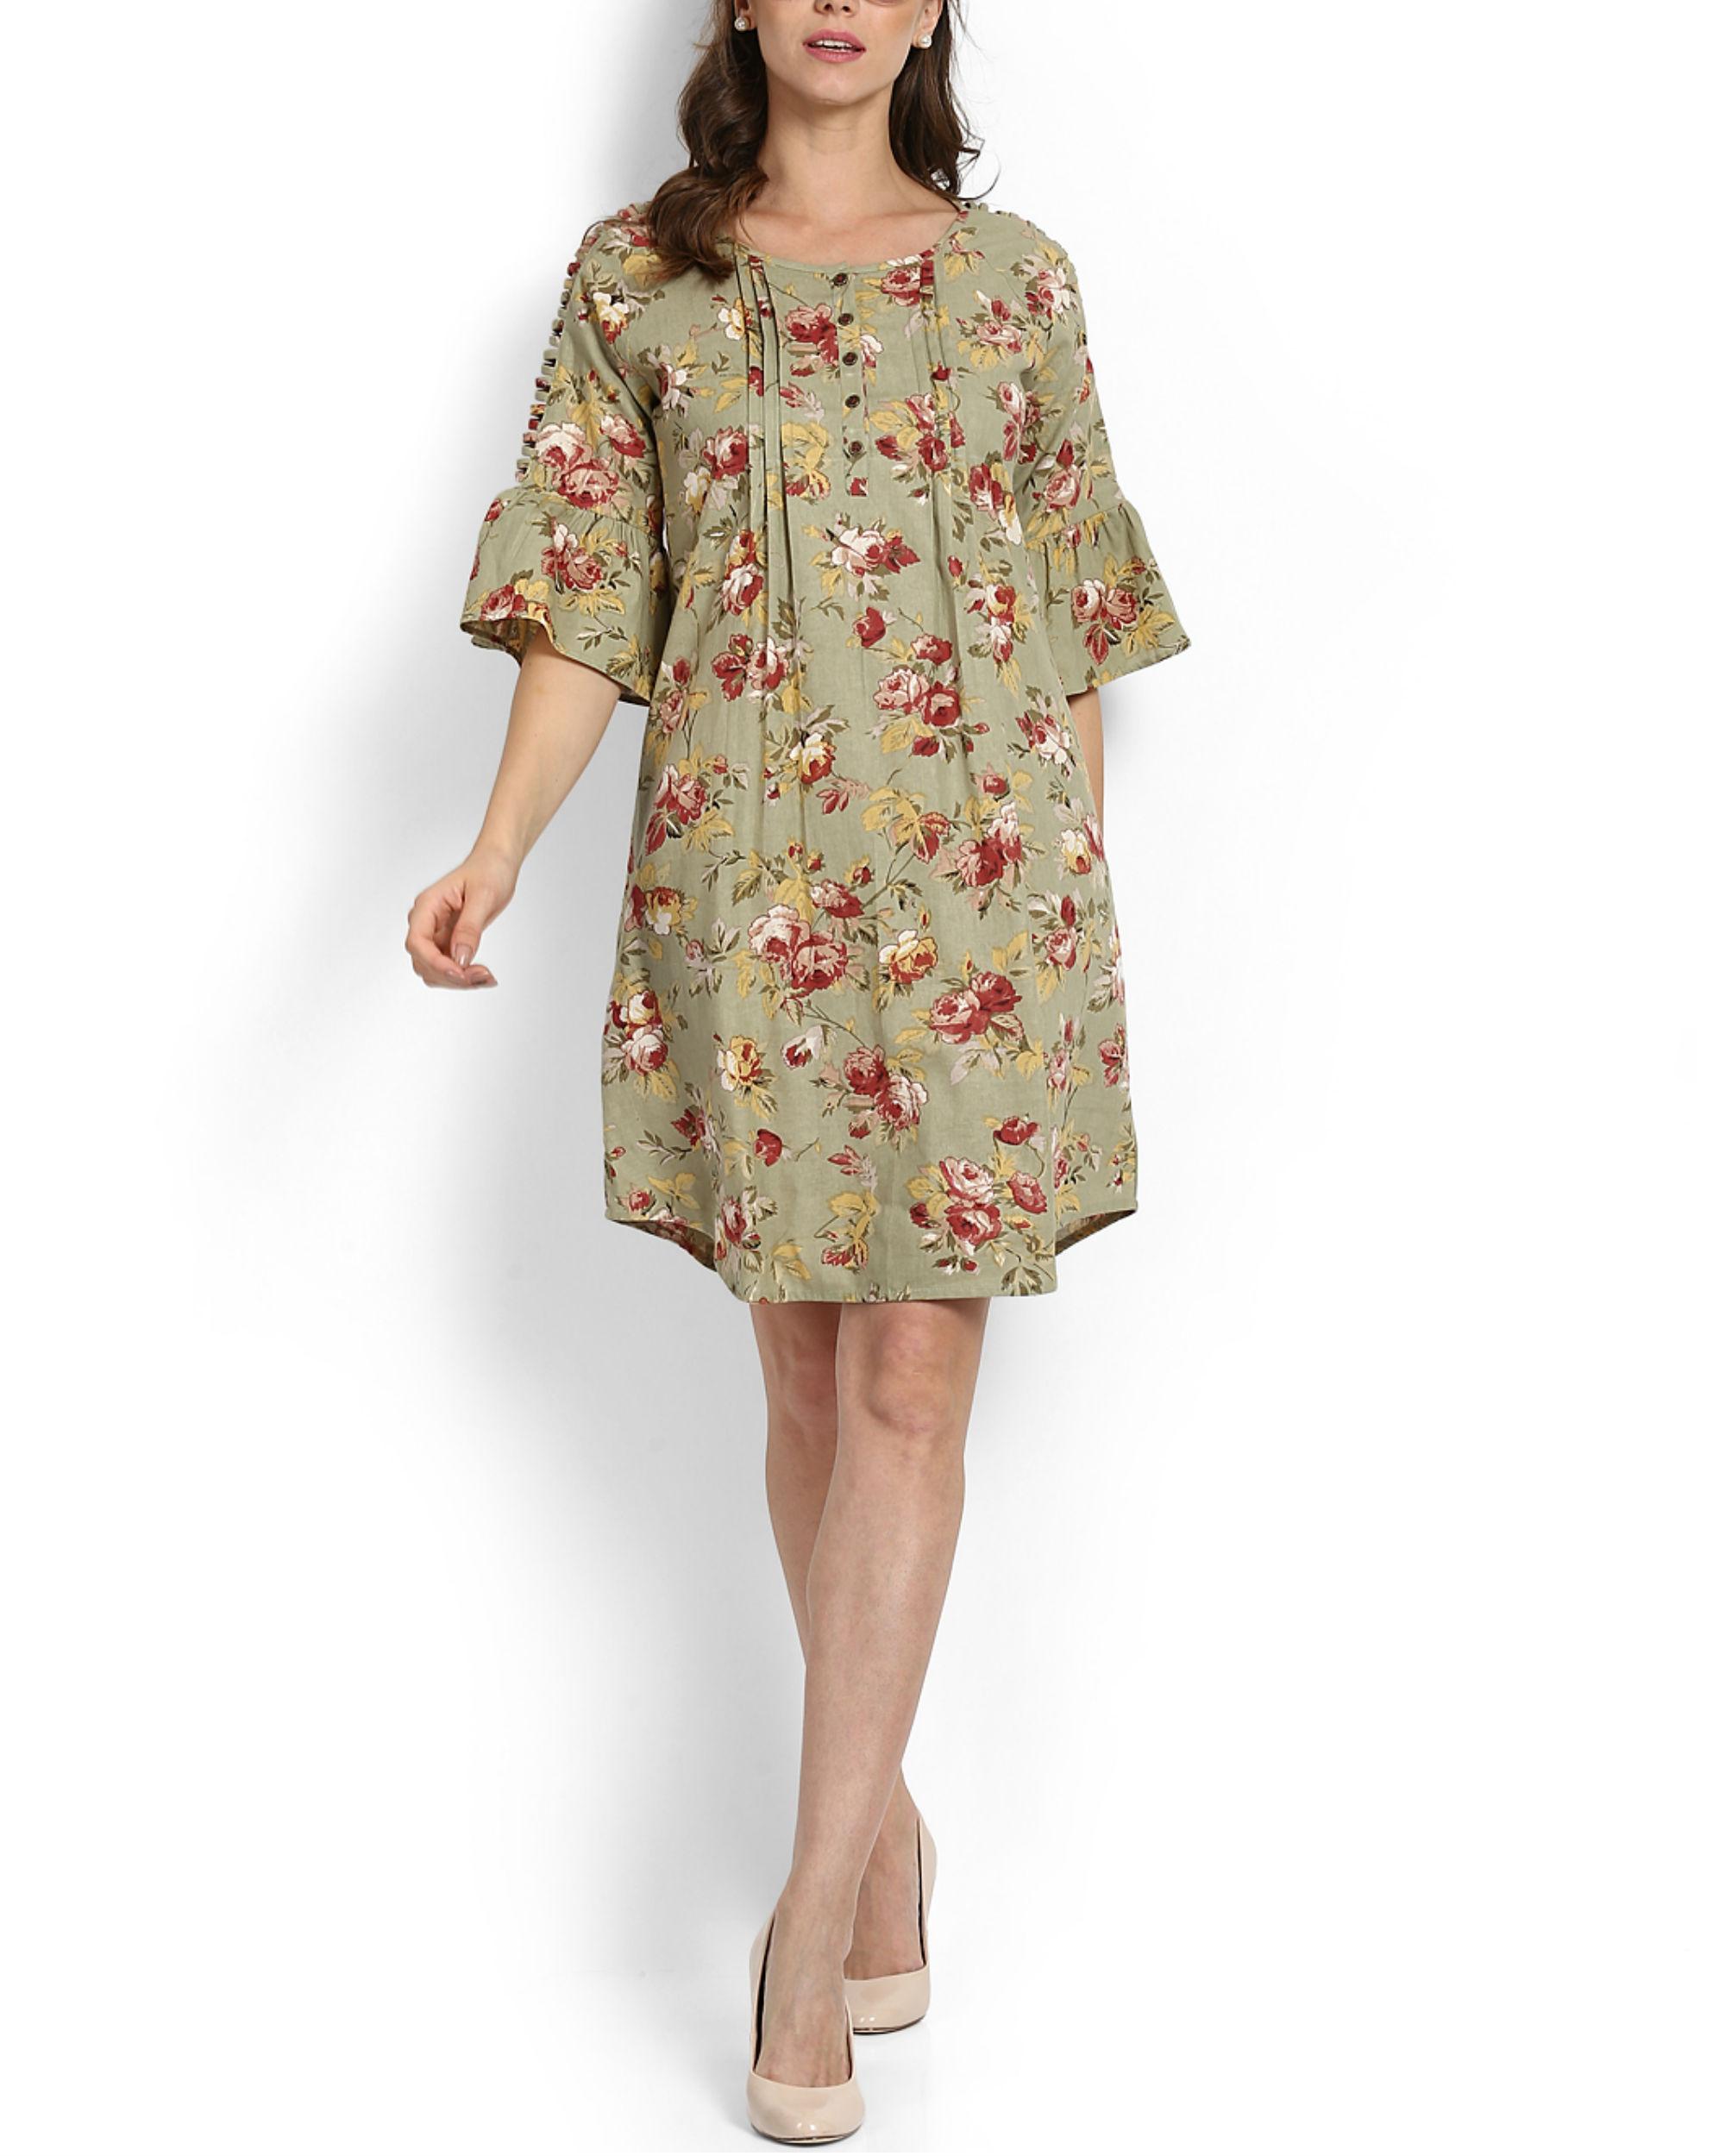 Sage green ruffle dress